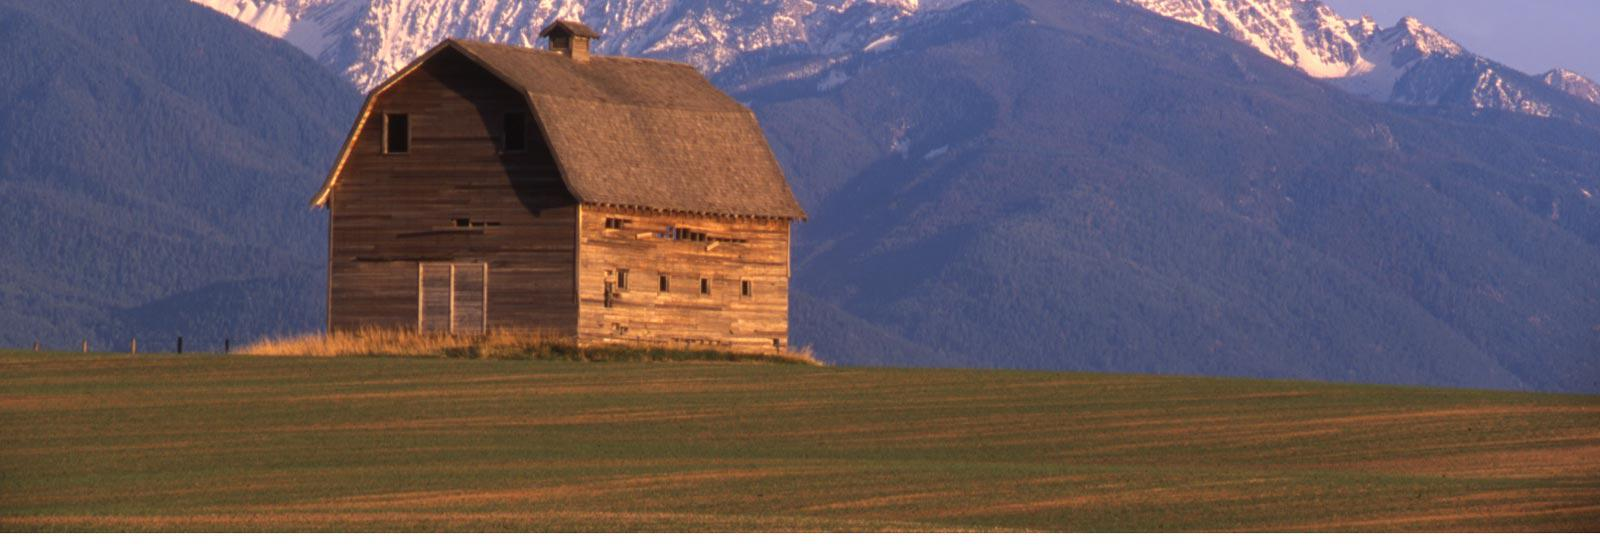 Montana Country Side